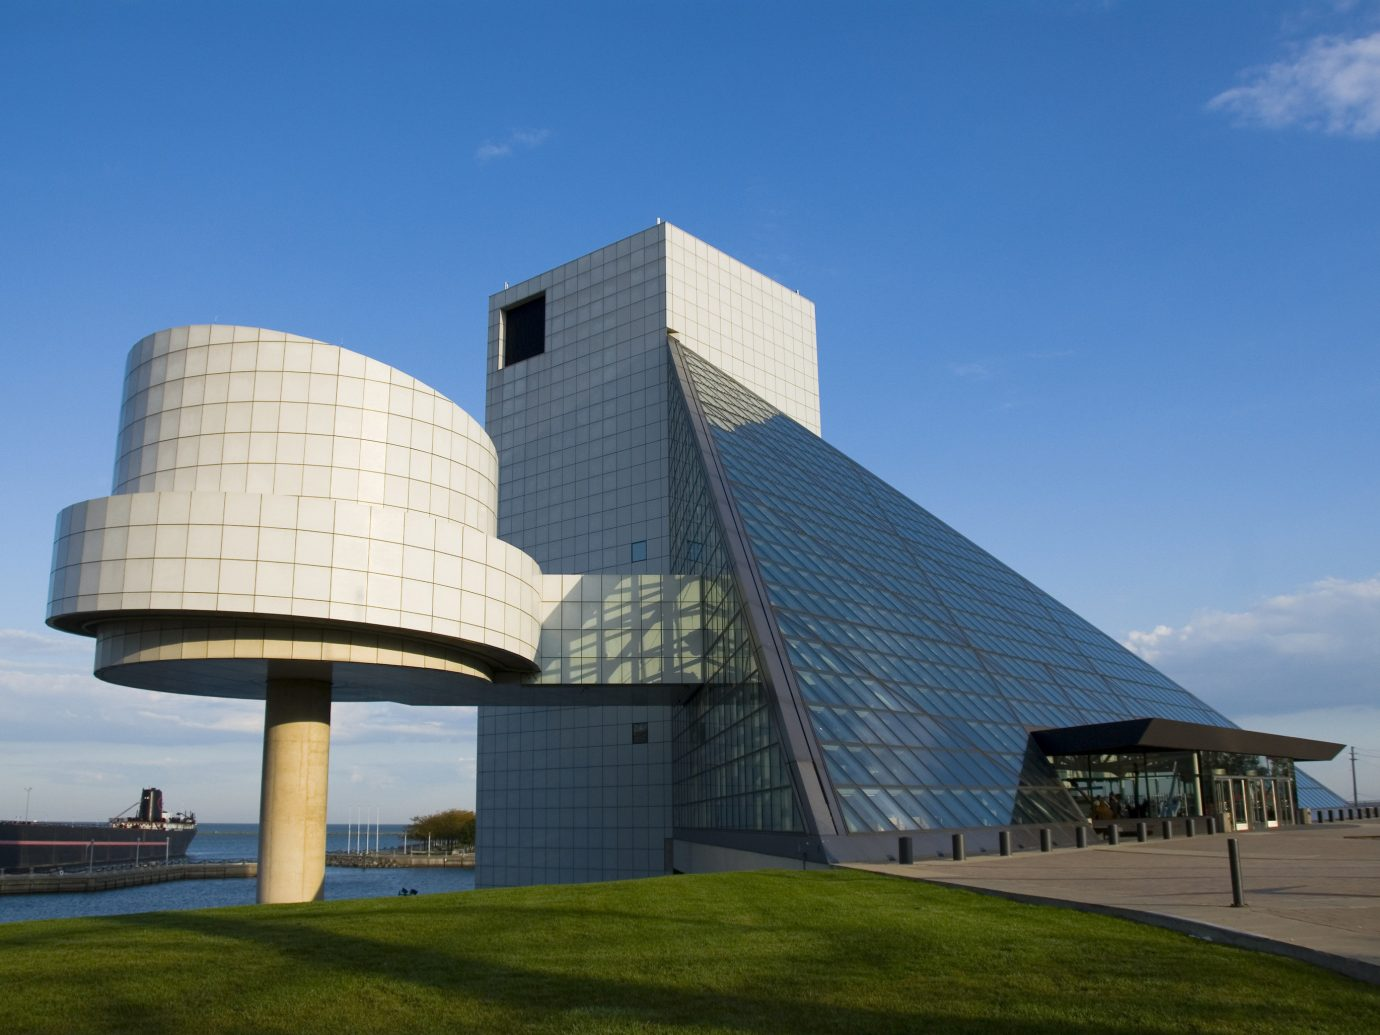 Road Trips Trip Ideas sky landmark Architecture daytime building corporate headquarters facade headquarters cloud